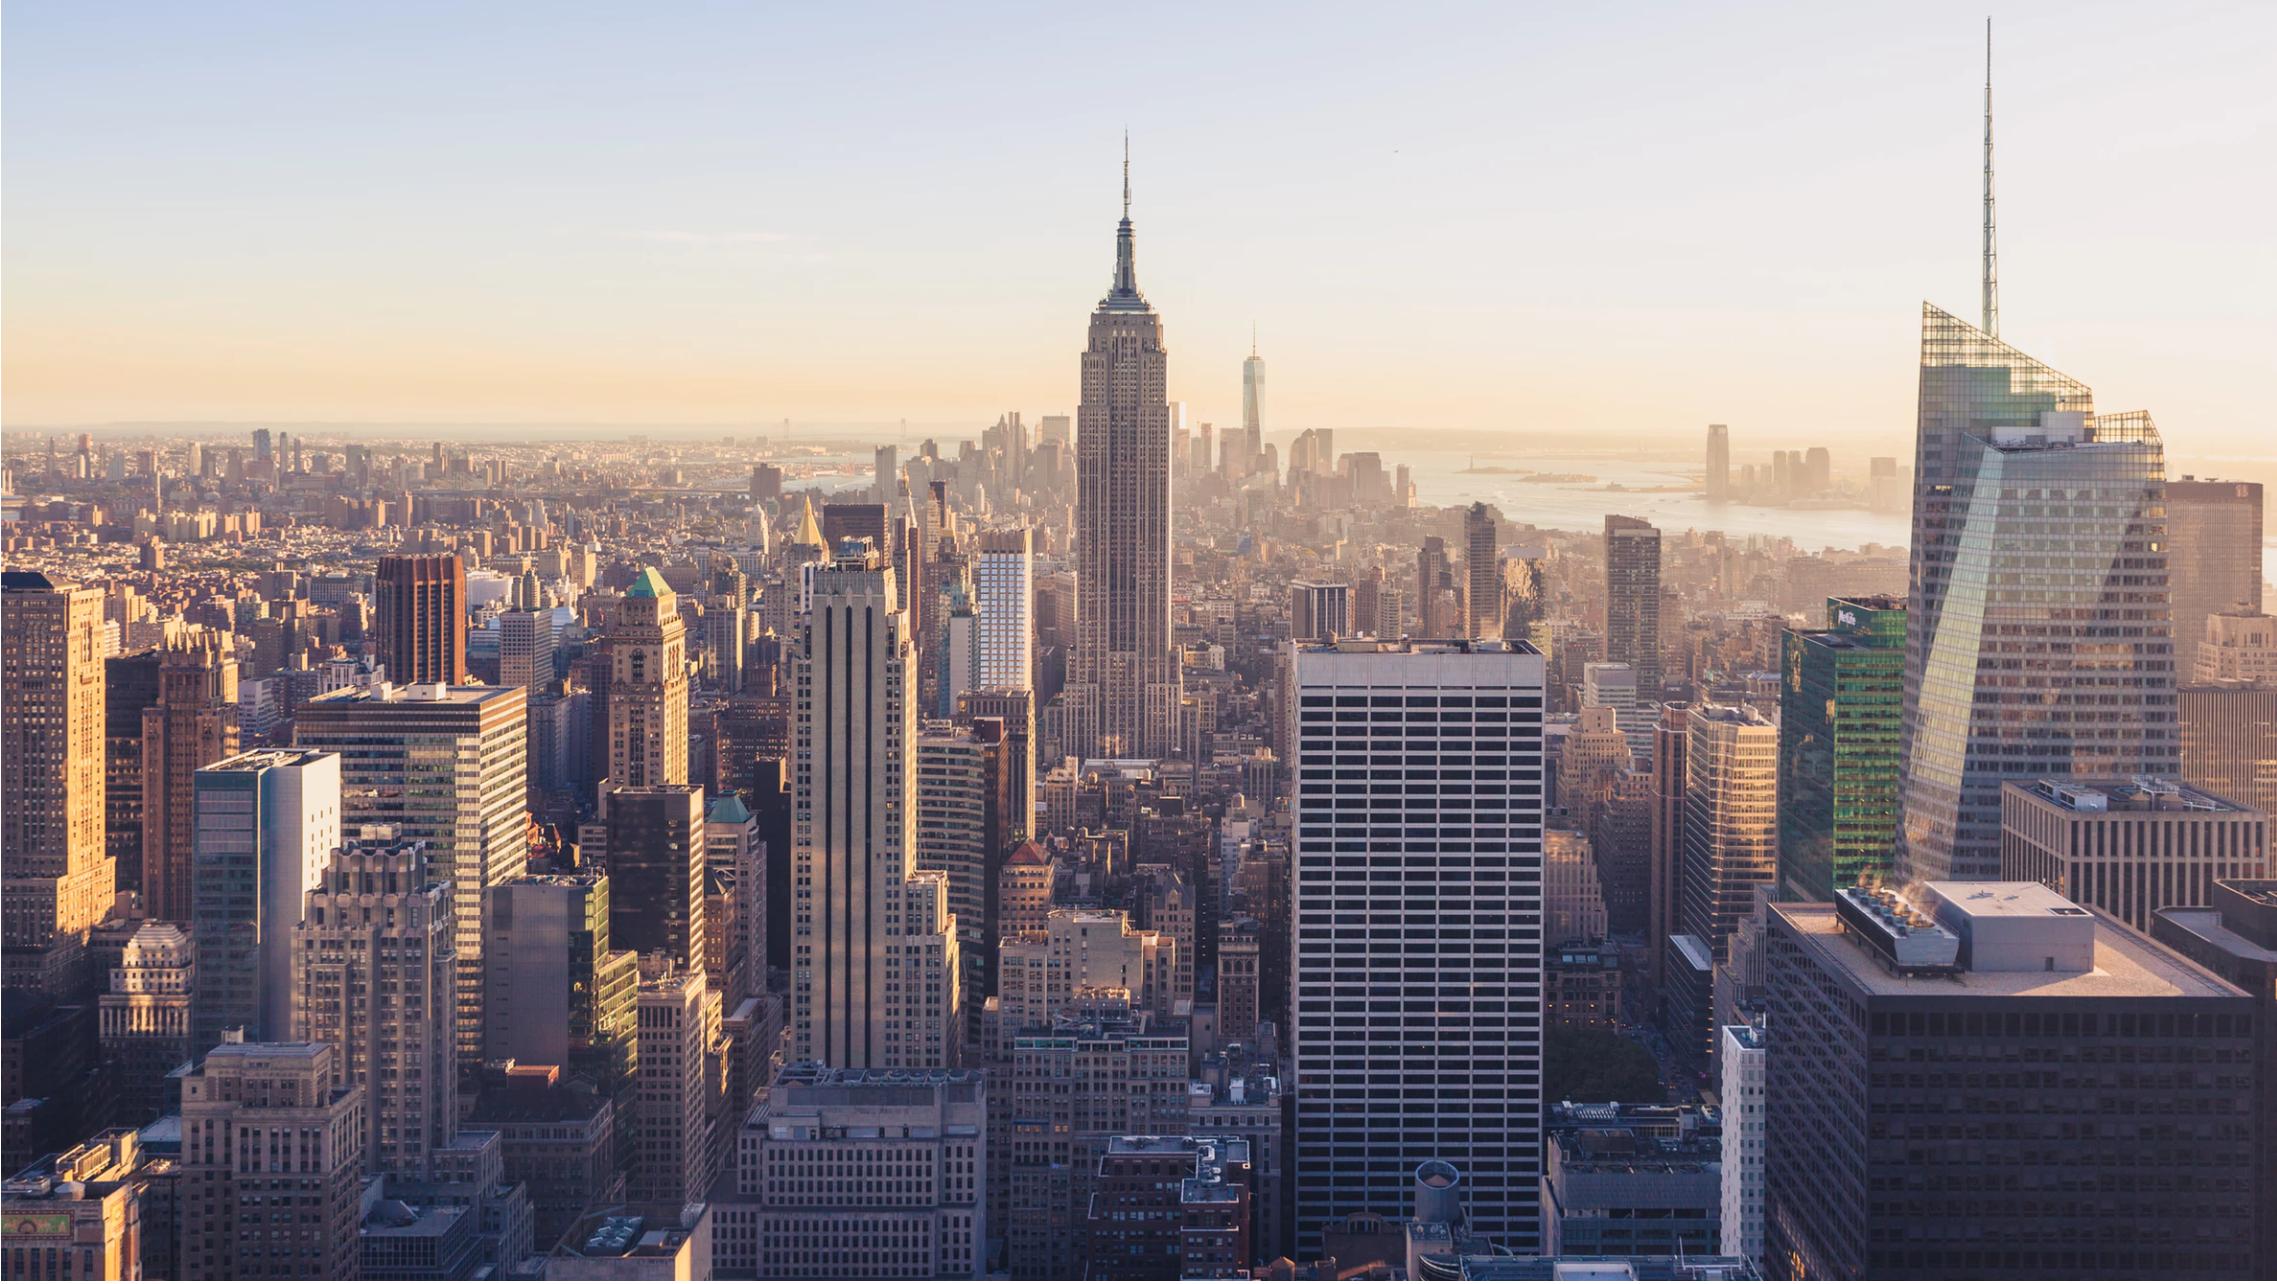 New York Skyline. Photo by Jonathan Riley, Unsplash.com